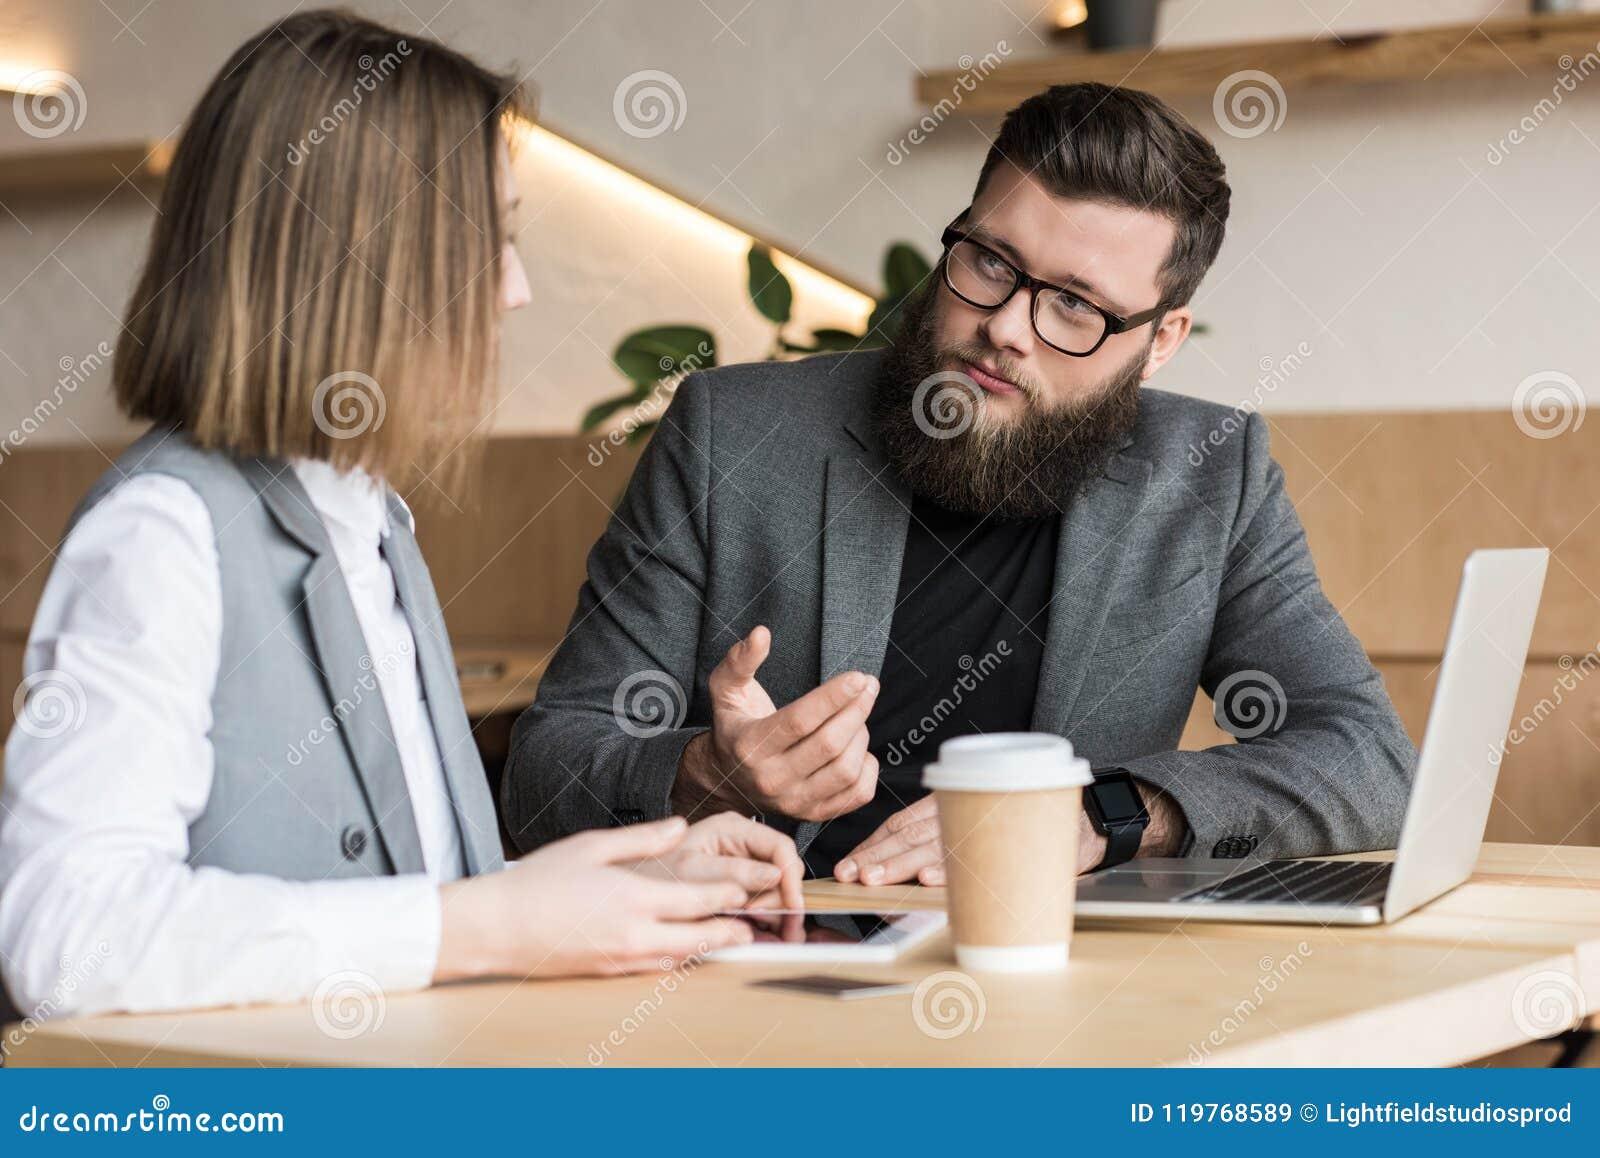 Partners die gesprek in moderne koffie met apparaten en koffie hebben